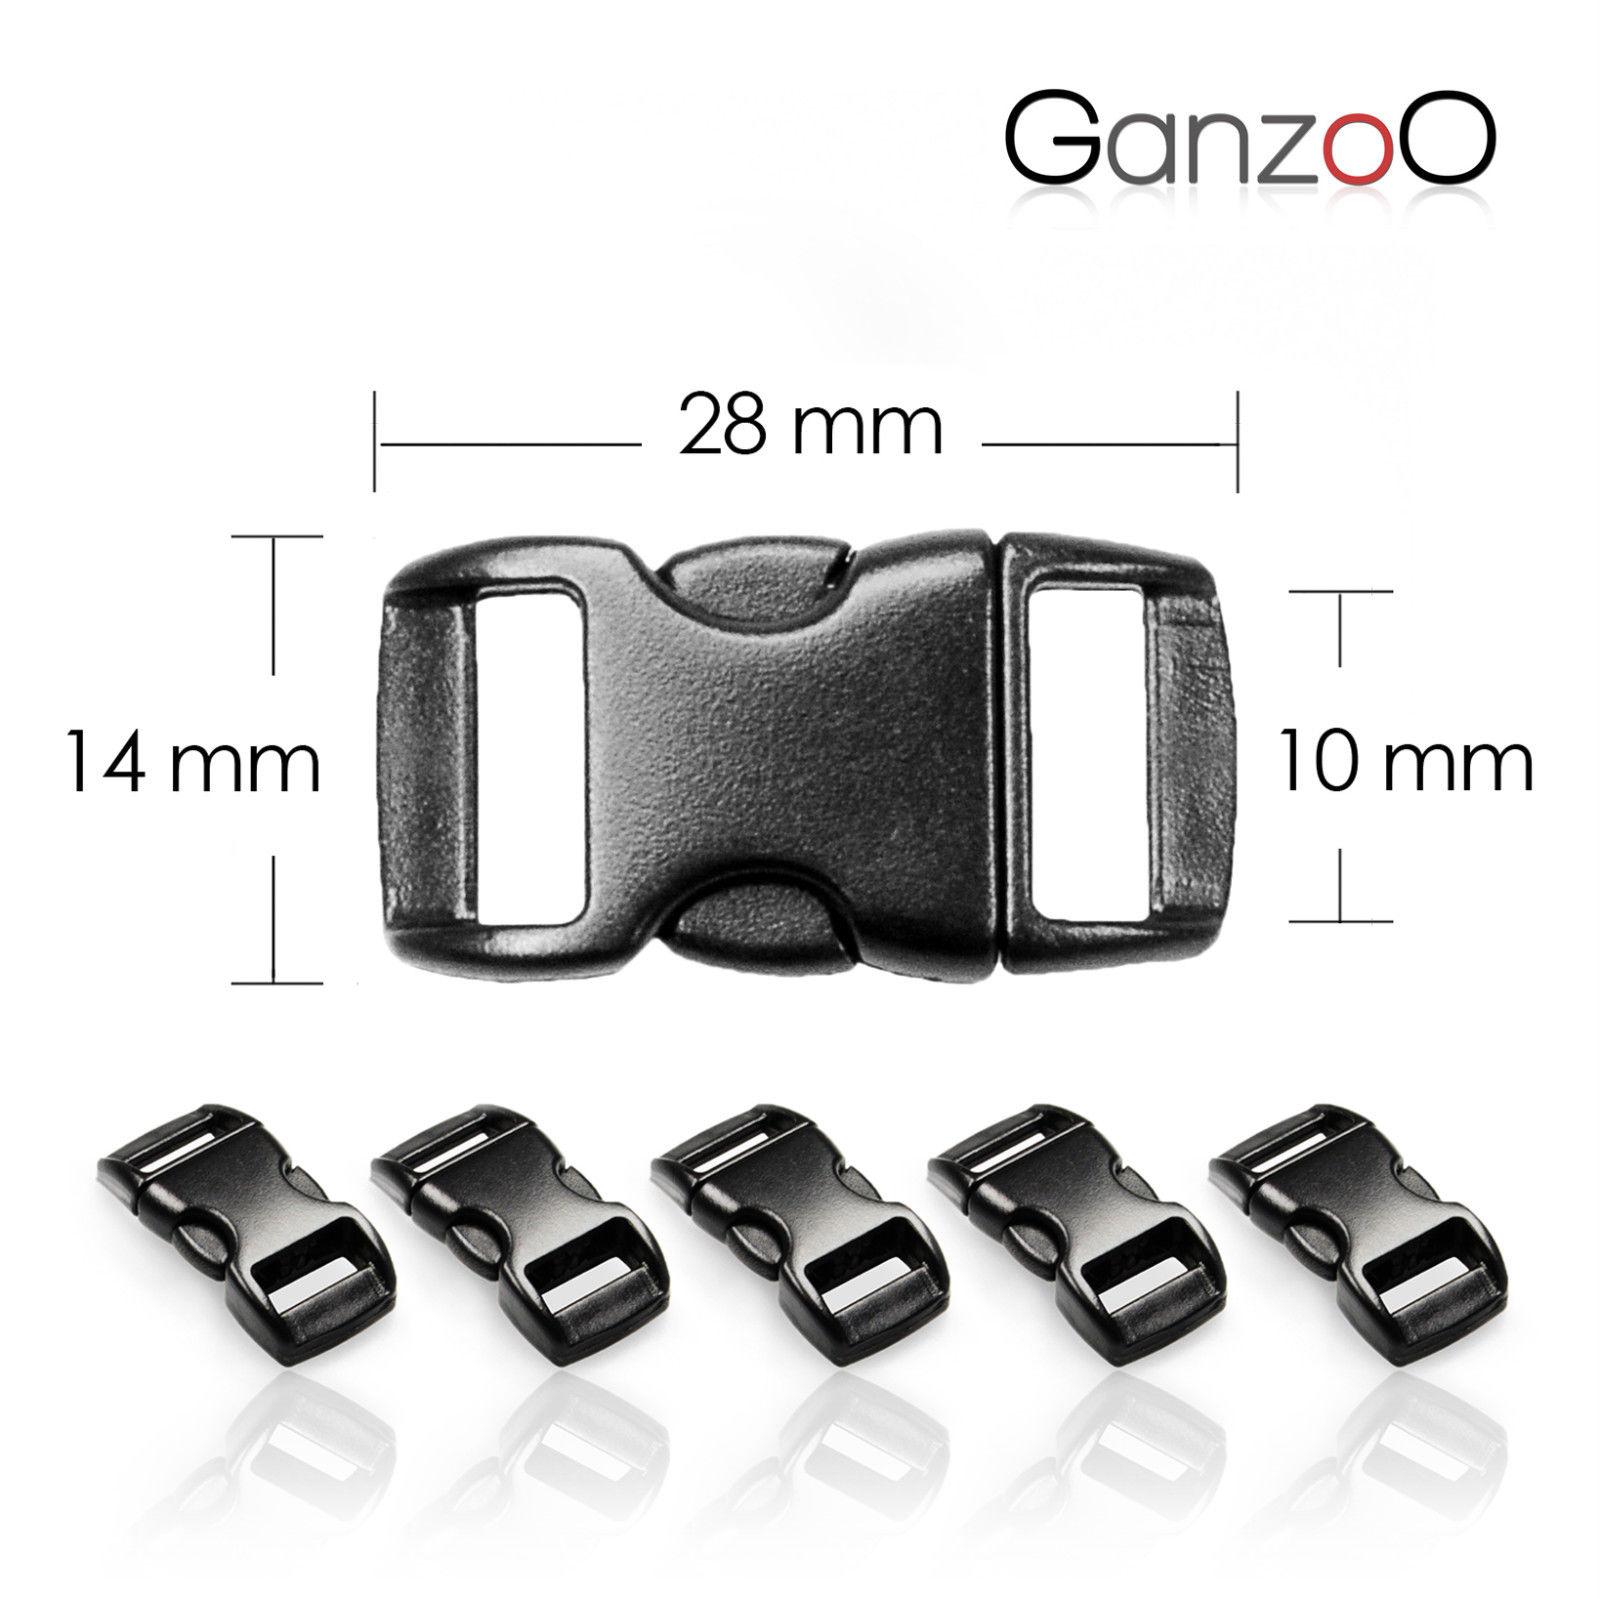 Ganzoo Paracord Starterset Armbnder 4 Sets mit 5 Verschlsse Maband Anleitung 253173909639 8